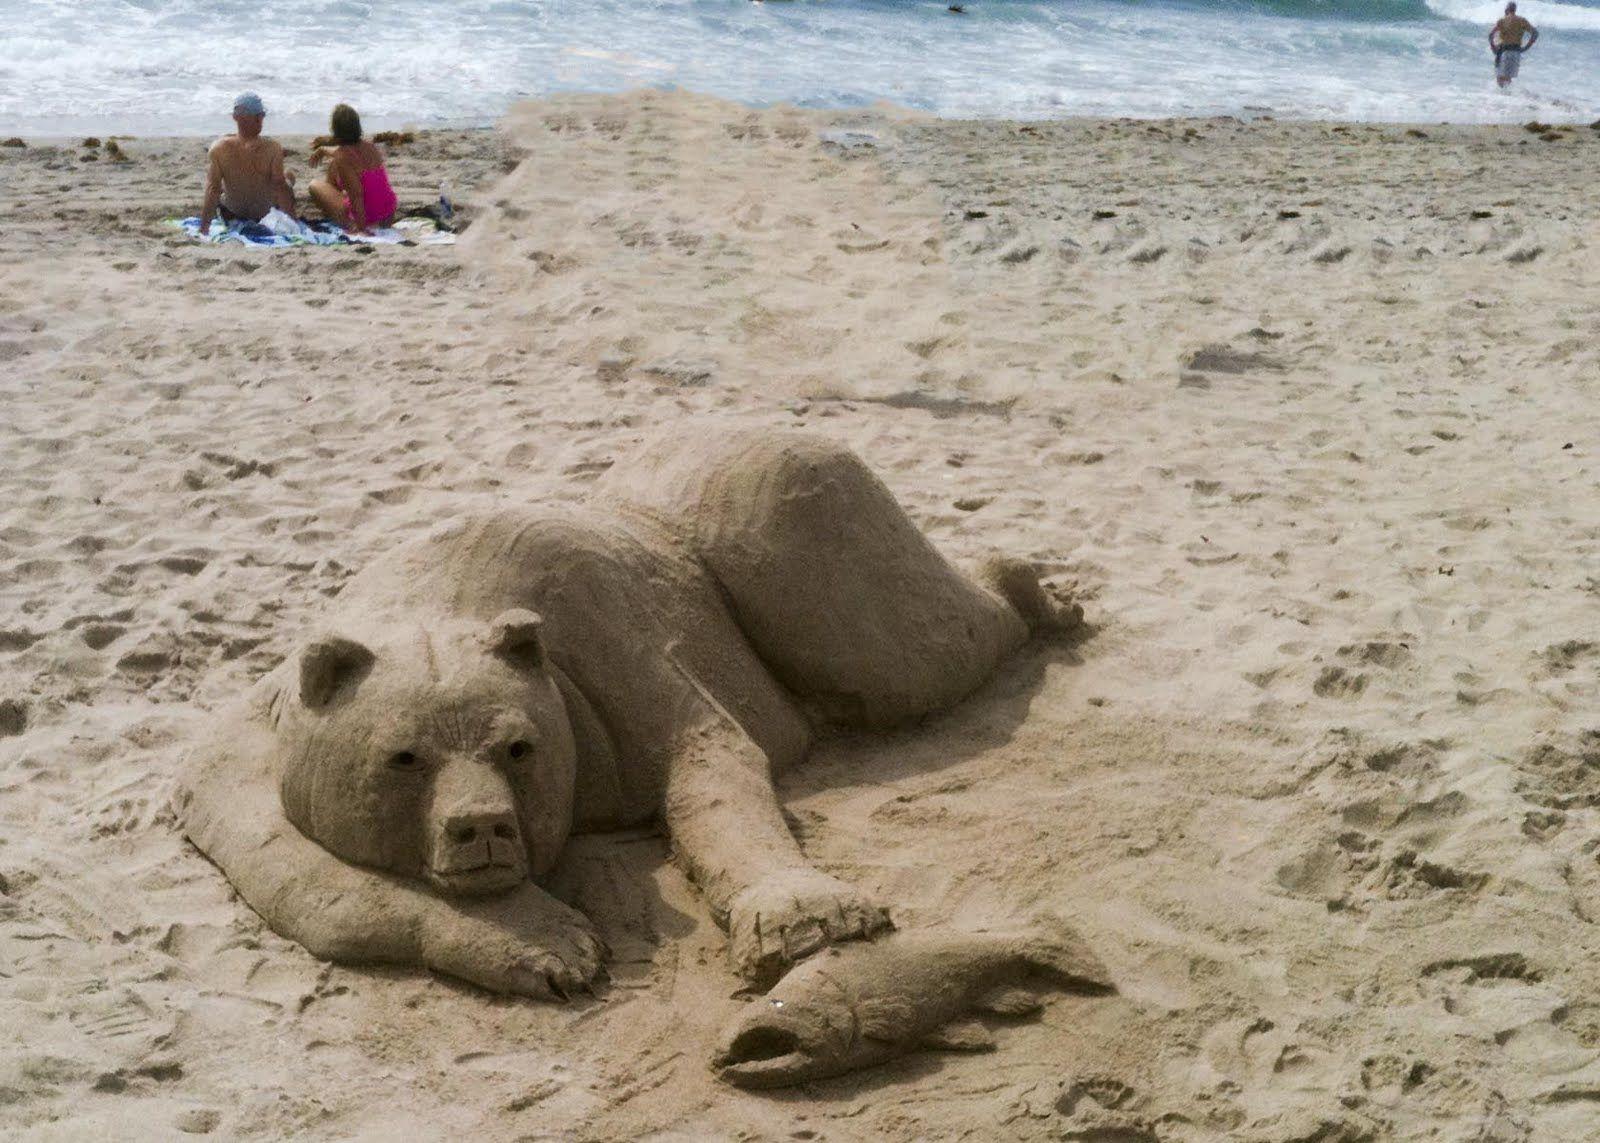 Beach Sand Sculptures | www.pixshark.com - Images ...